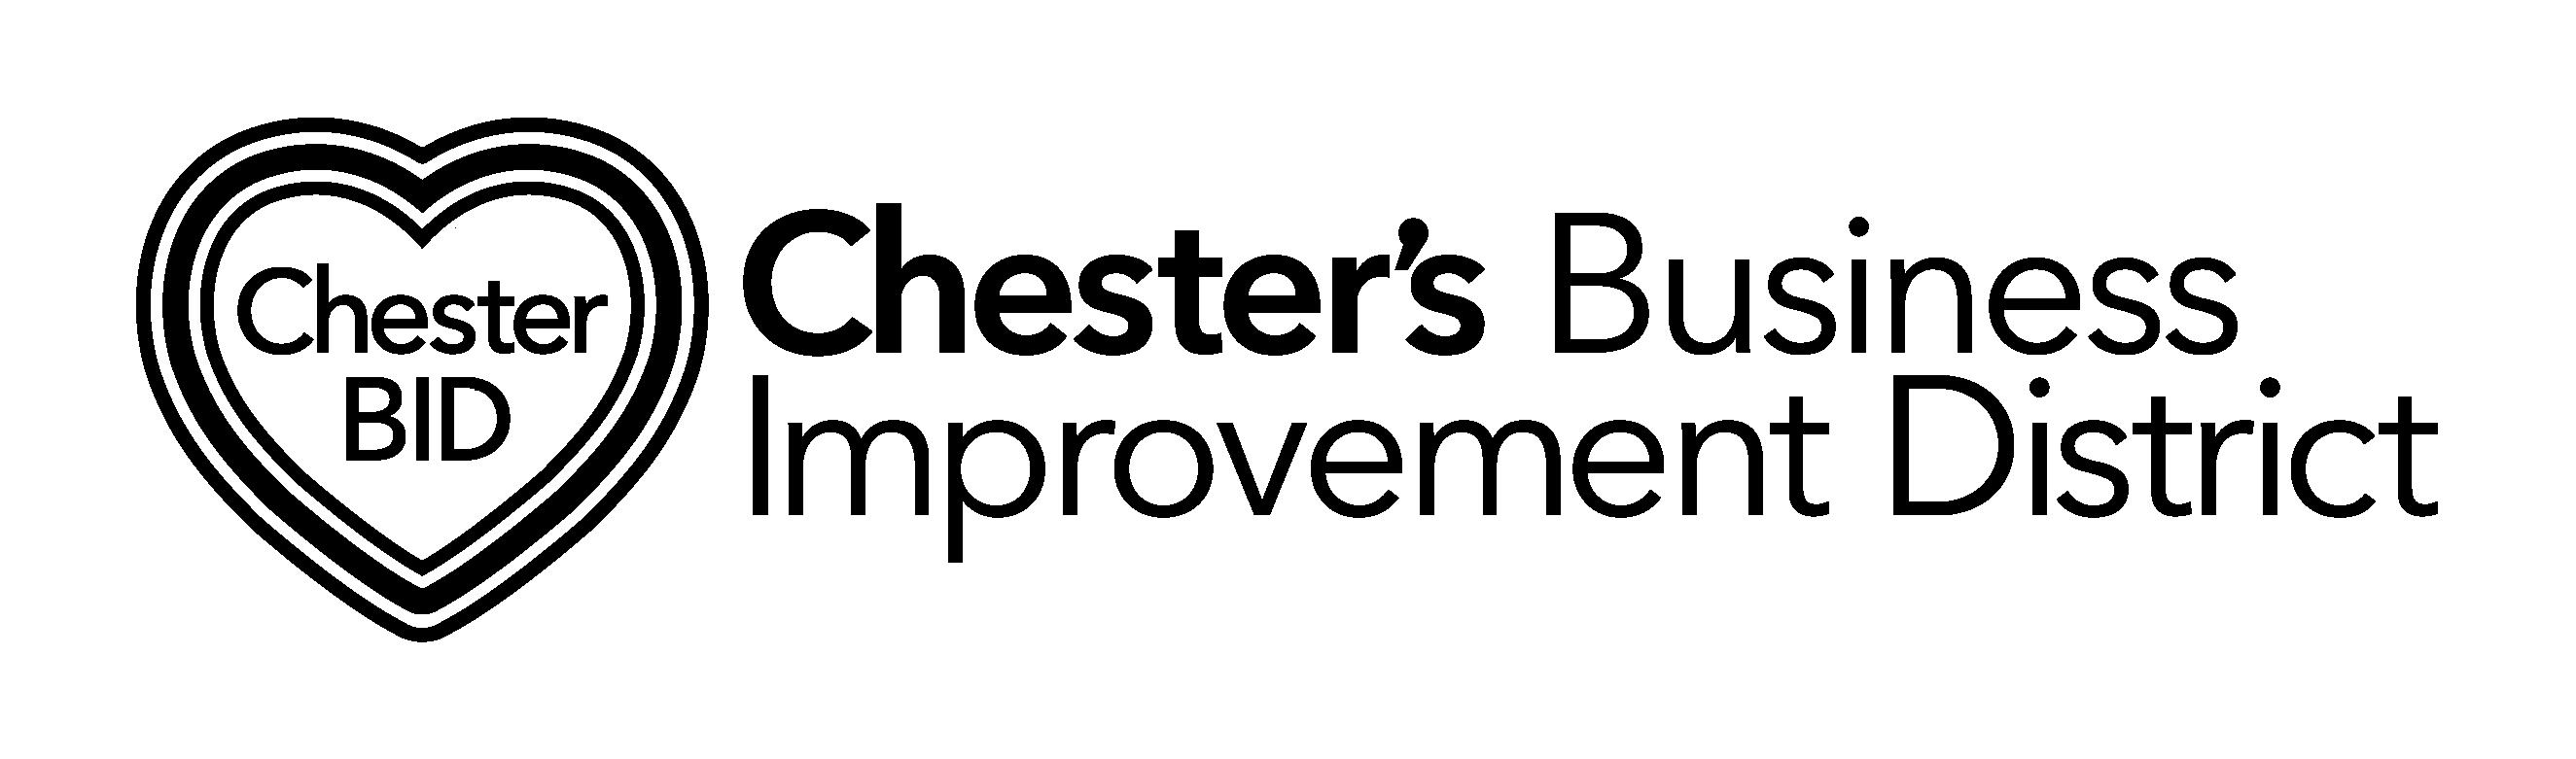 Chester BID